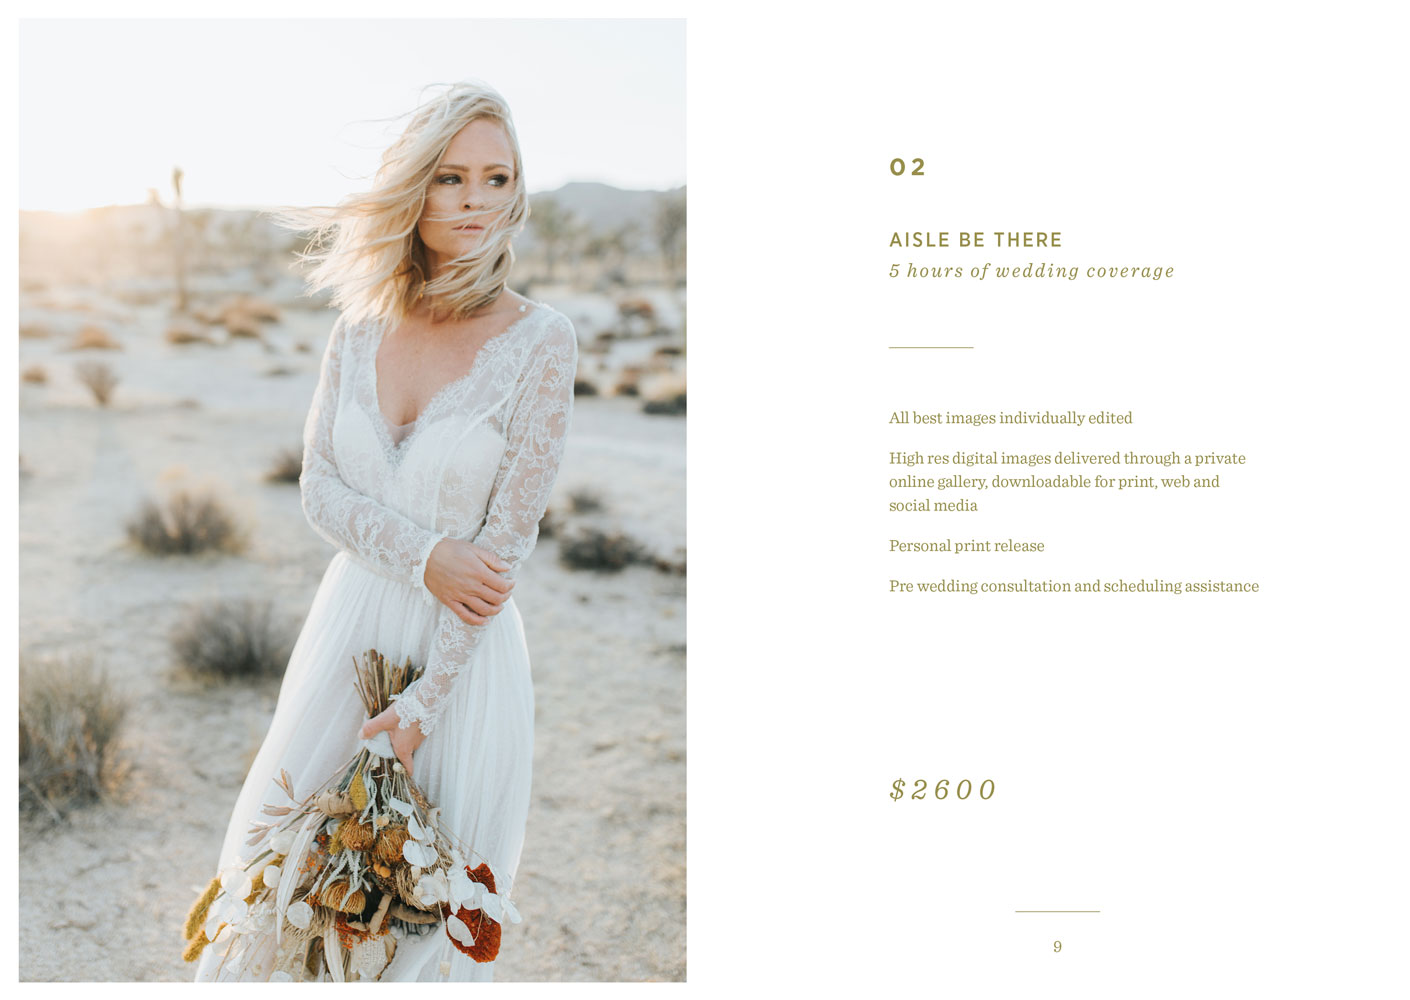 MallorySparkles_Weddings_20195.jpg